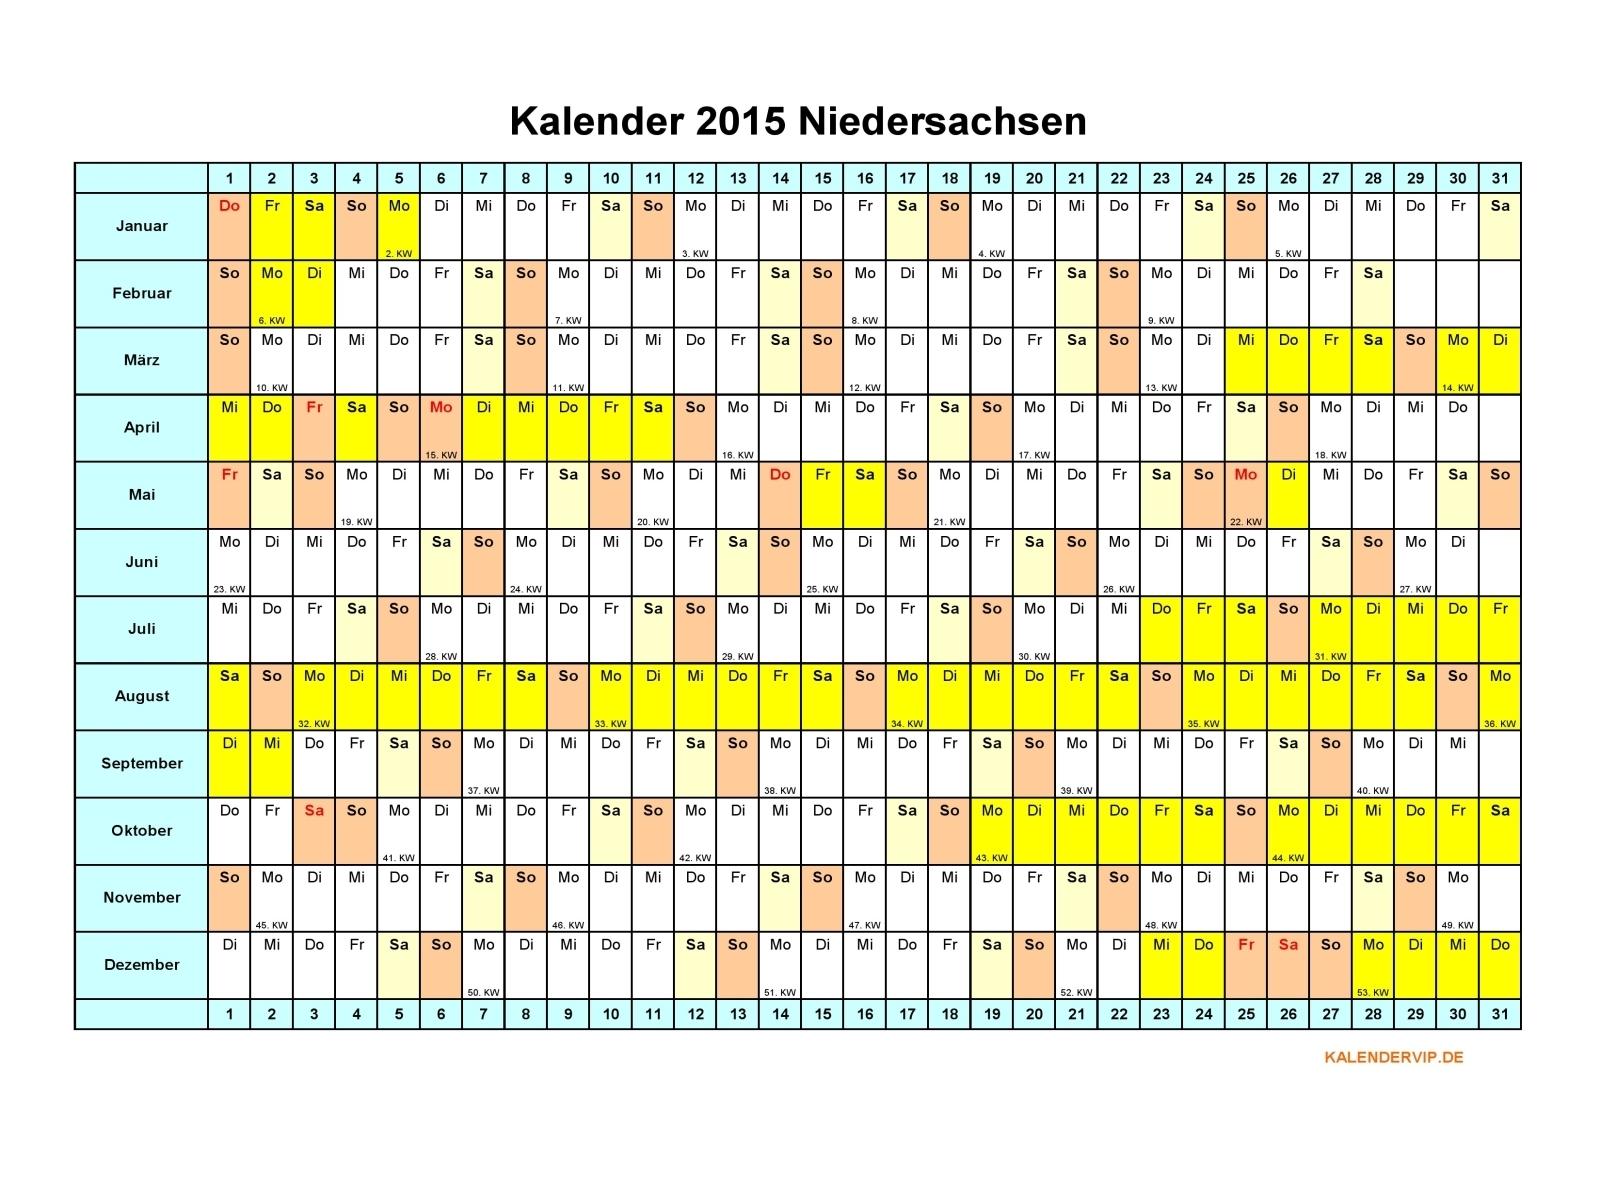 Kalender 2015 Niedersachsen - KalenderVIP